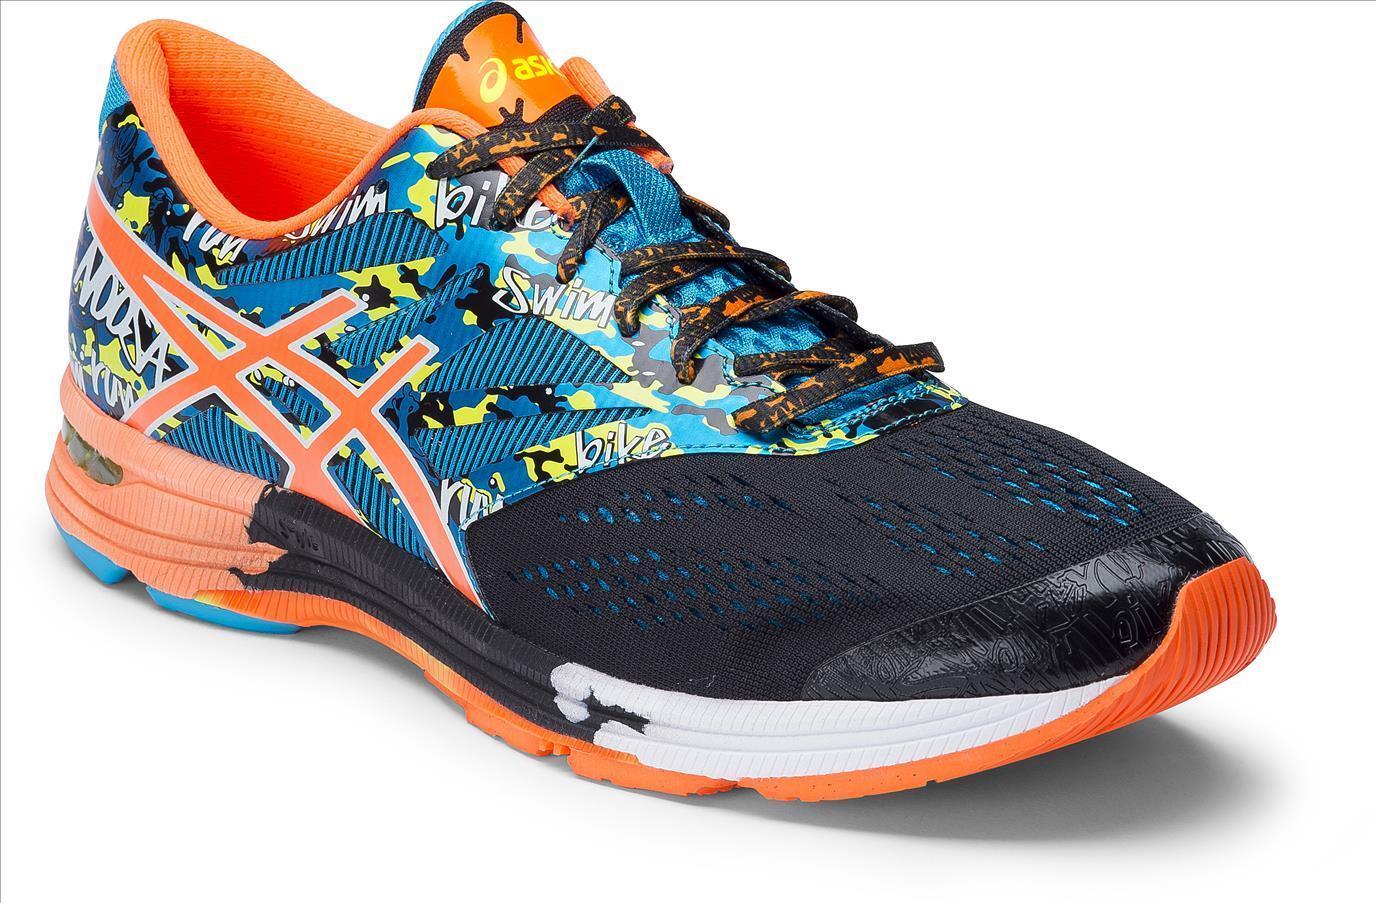 Asics Gel Noosa Tri 10 Mens Running schuhe (D) (9030) + FREE AUS DELIVERY